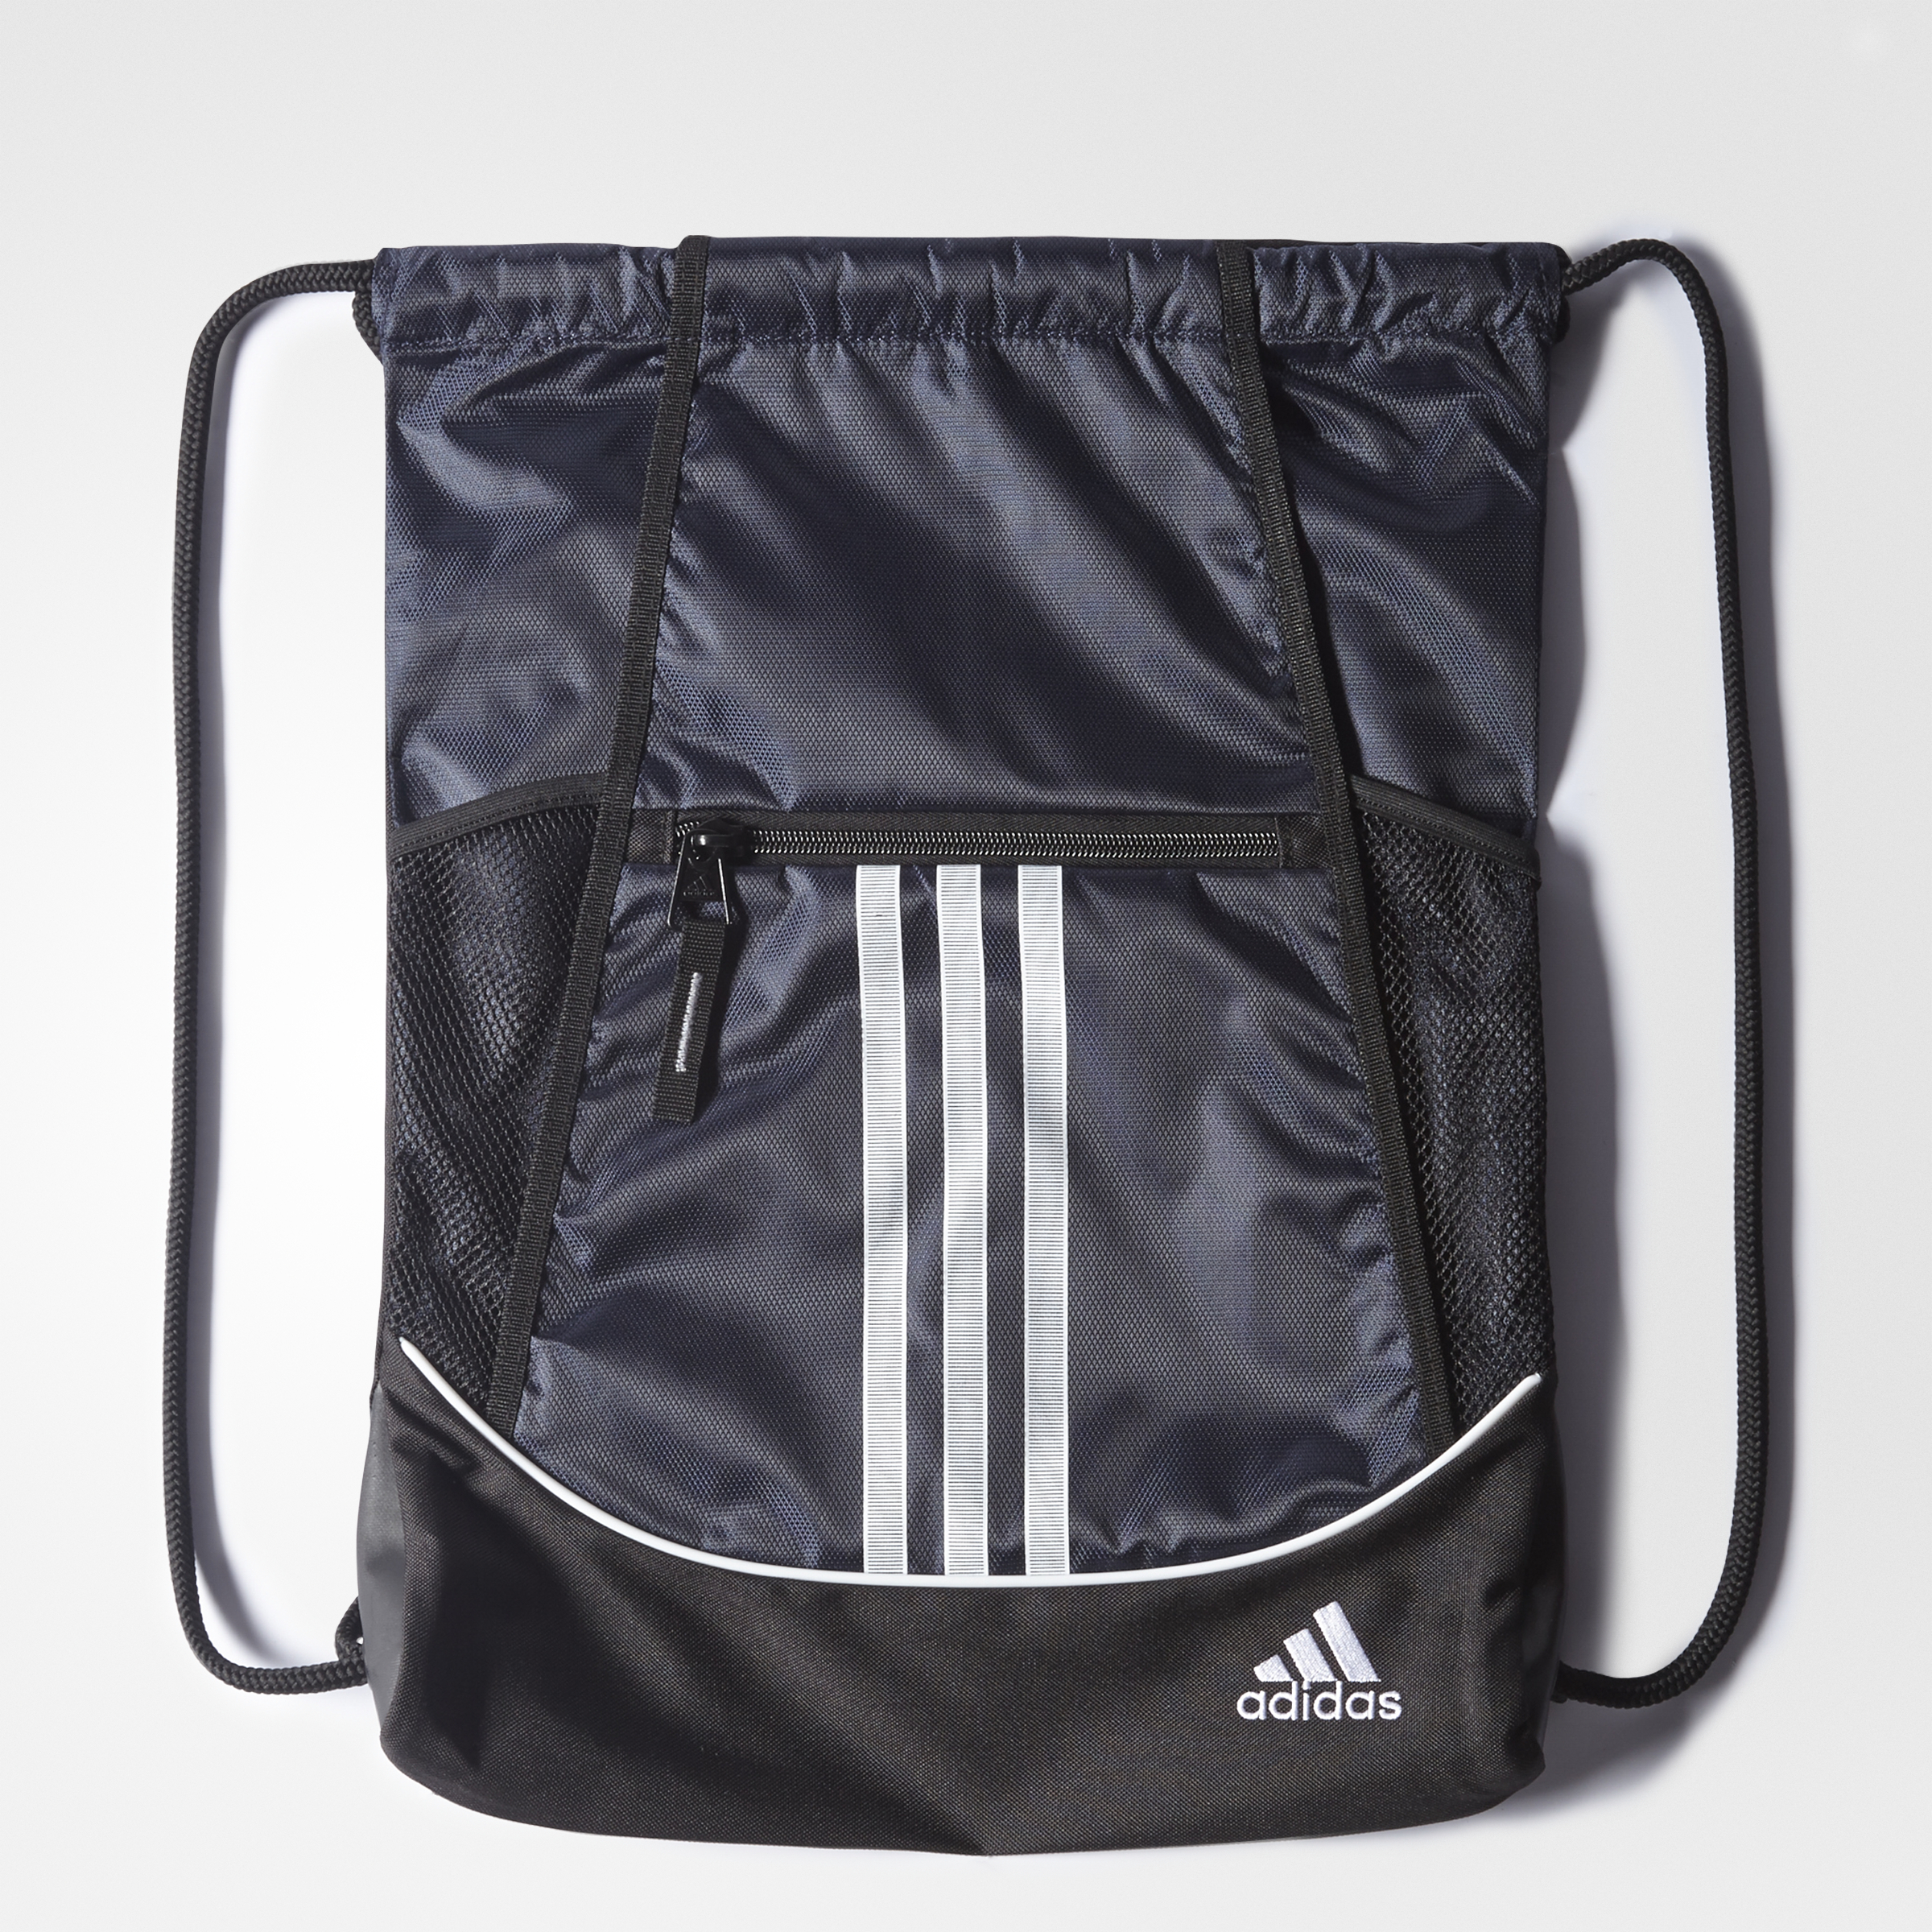 adidas-Lightning-Sackpack-Bags thumbnail 9